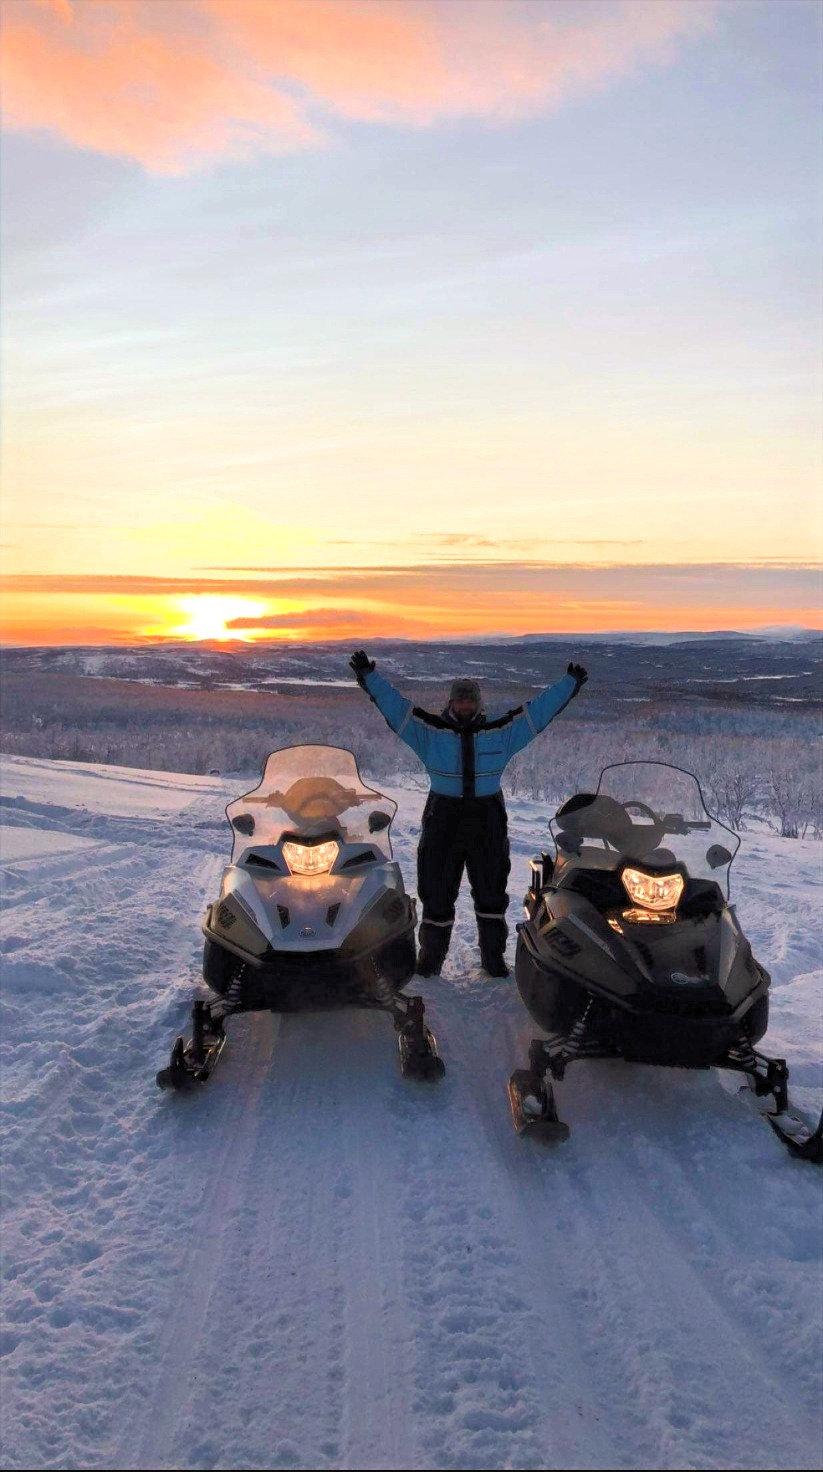 Snowmobile safari on the Arctic Tundra